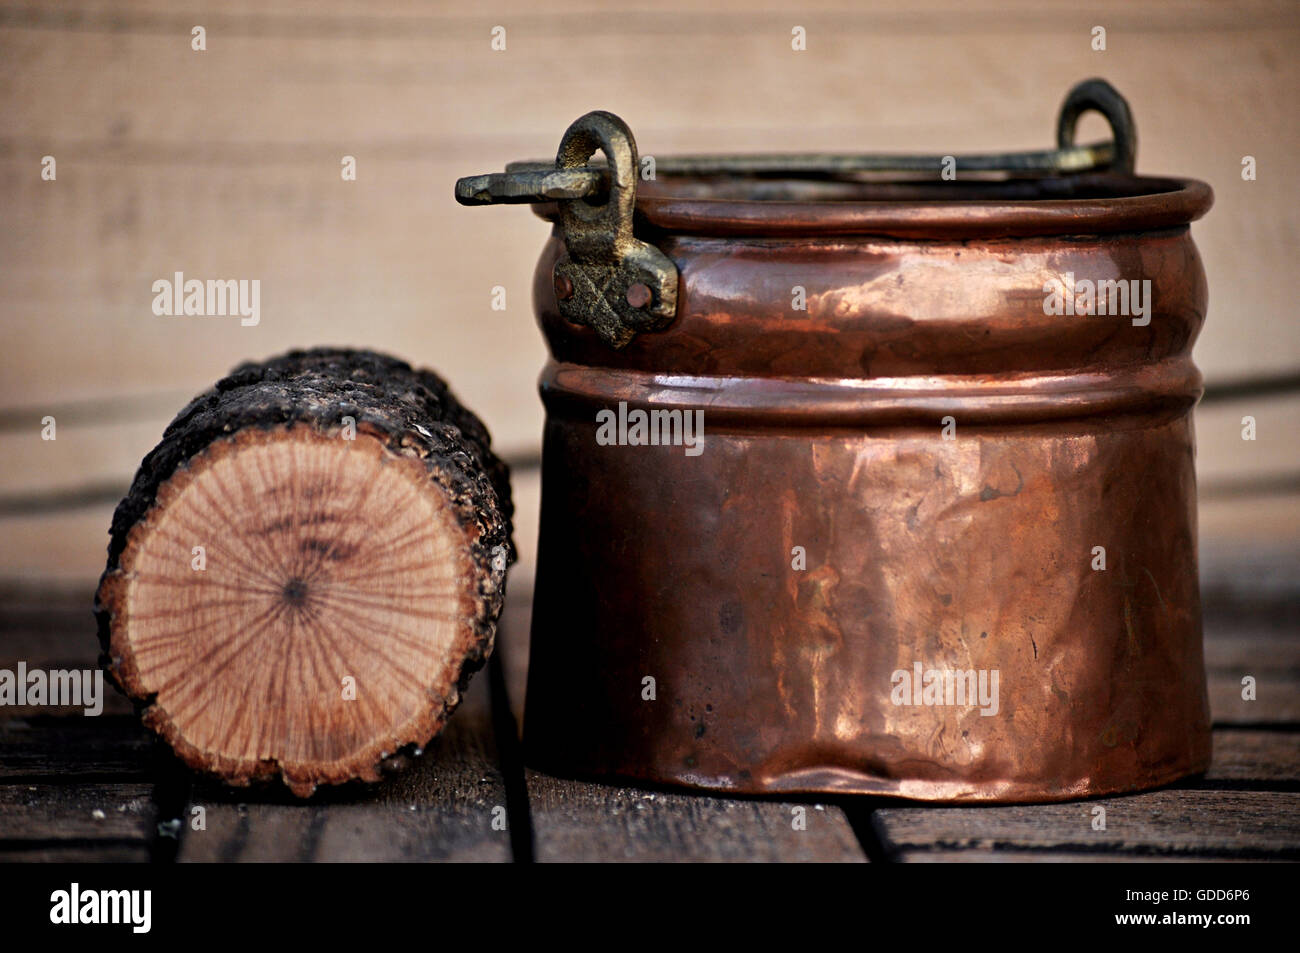 copper cauldron and round wood - Stock Image